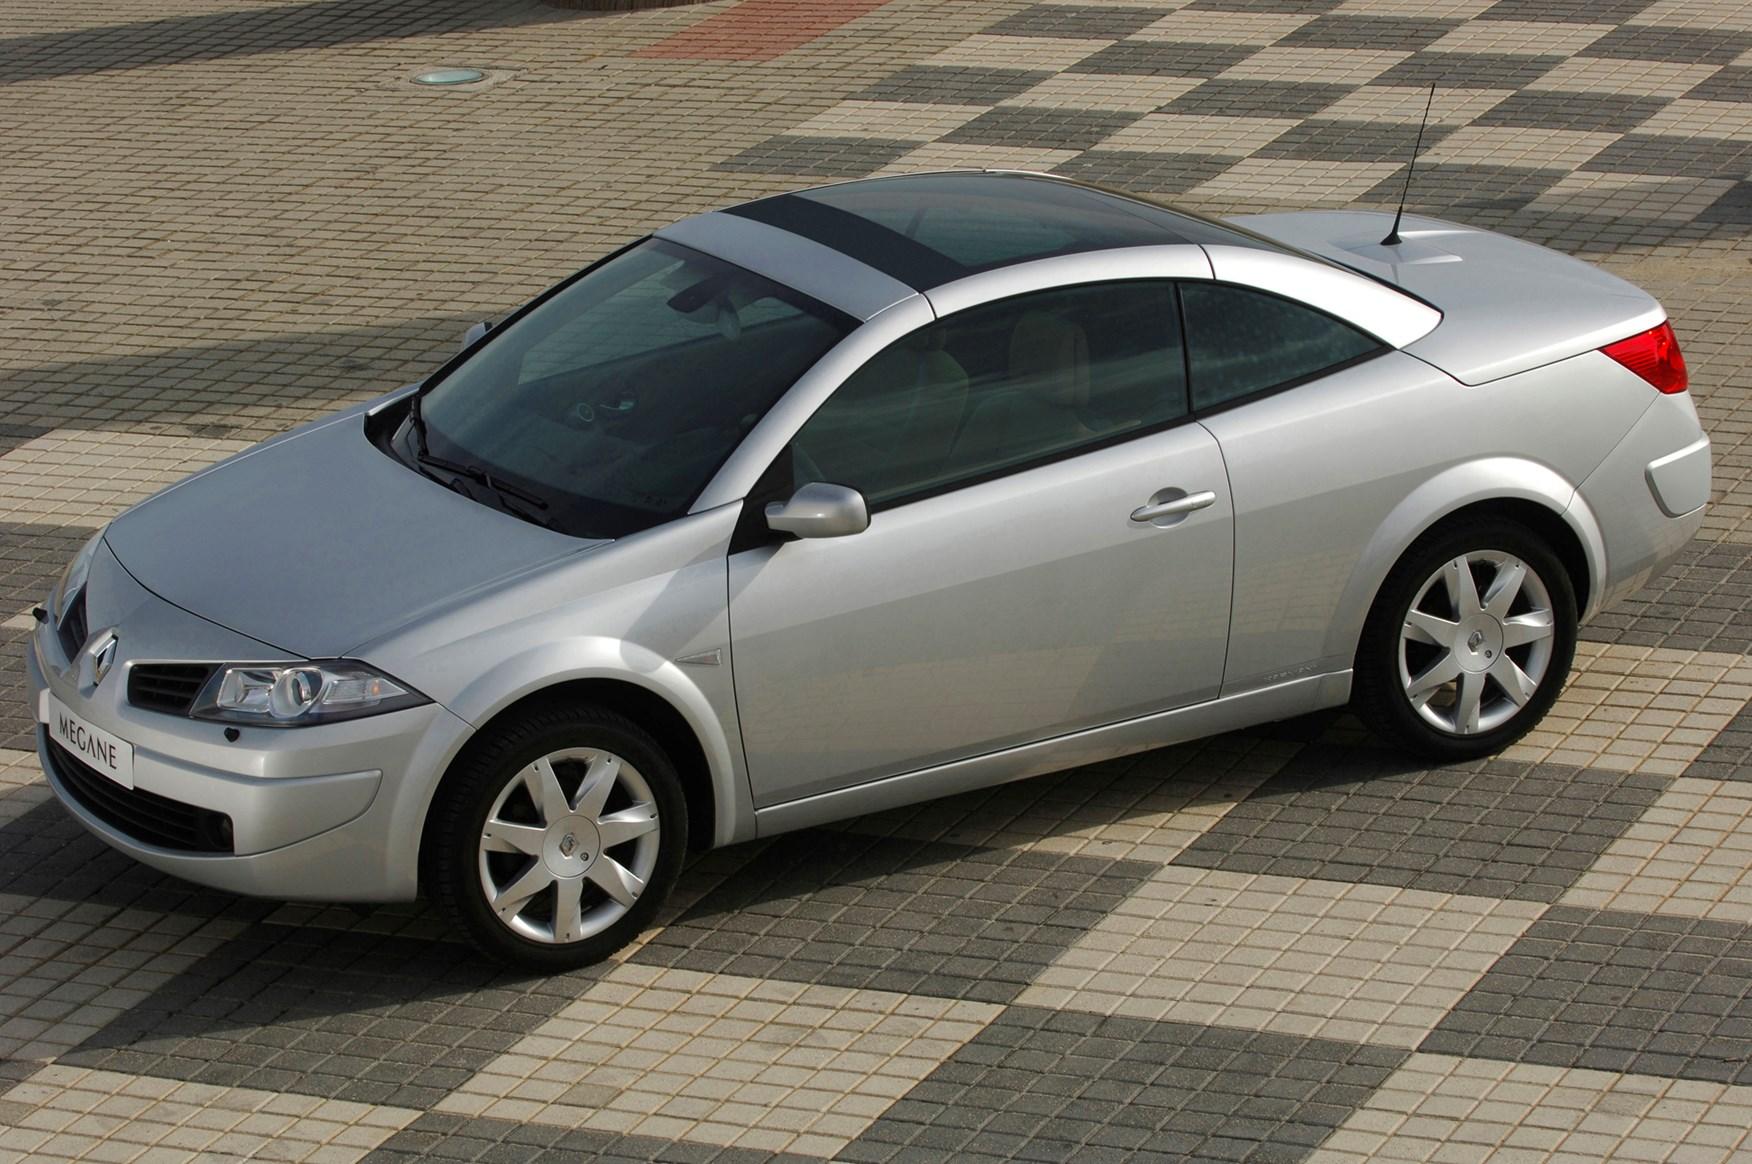 Used Renault Megane Cabriolet 2006 2009 Practicality Parkers